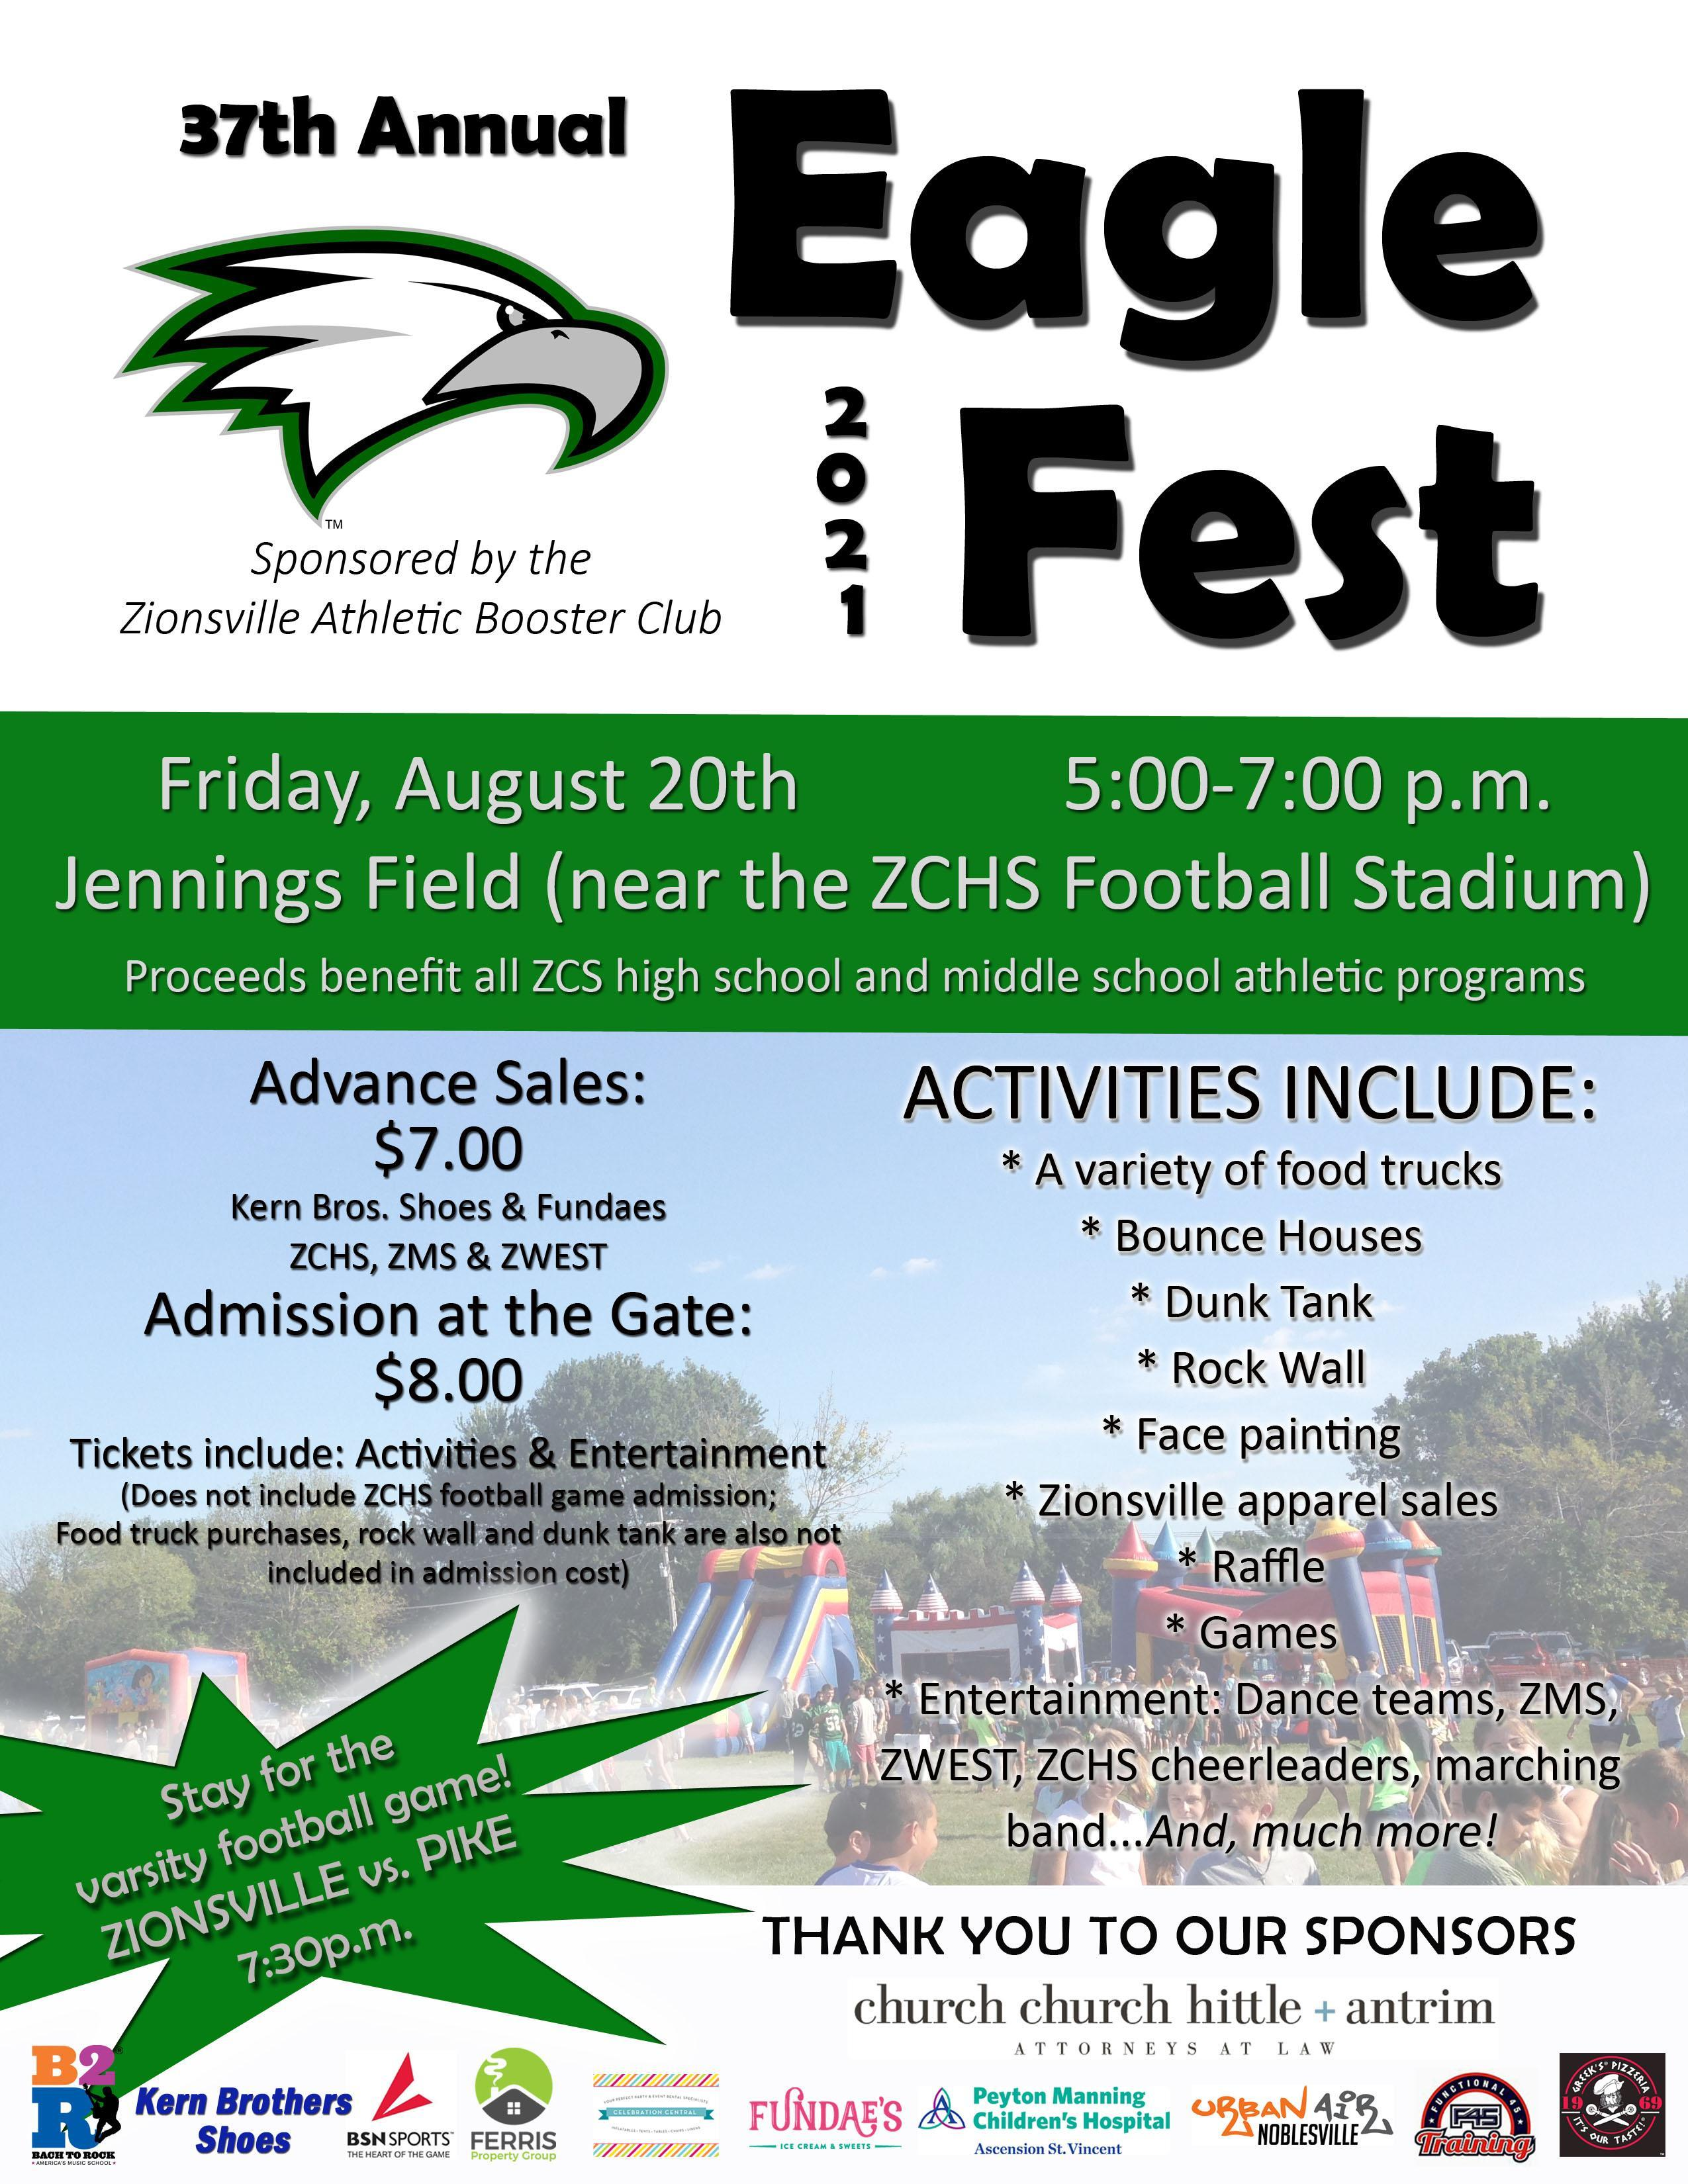 Eagle Fest 2021